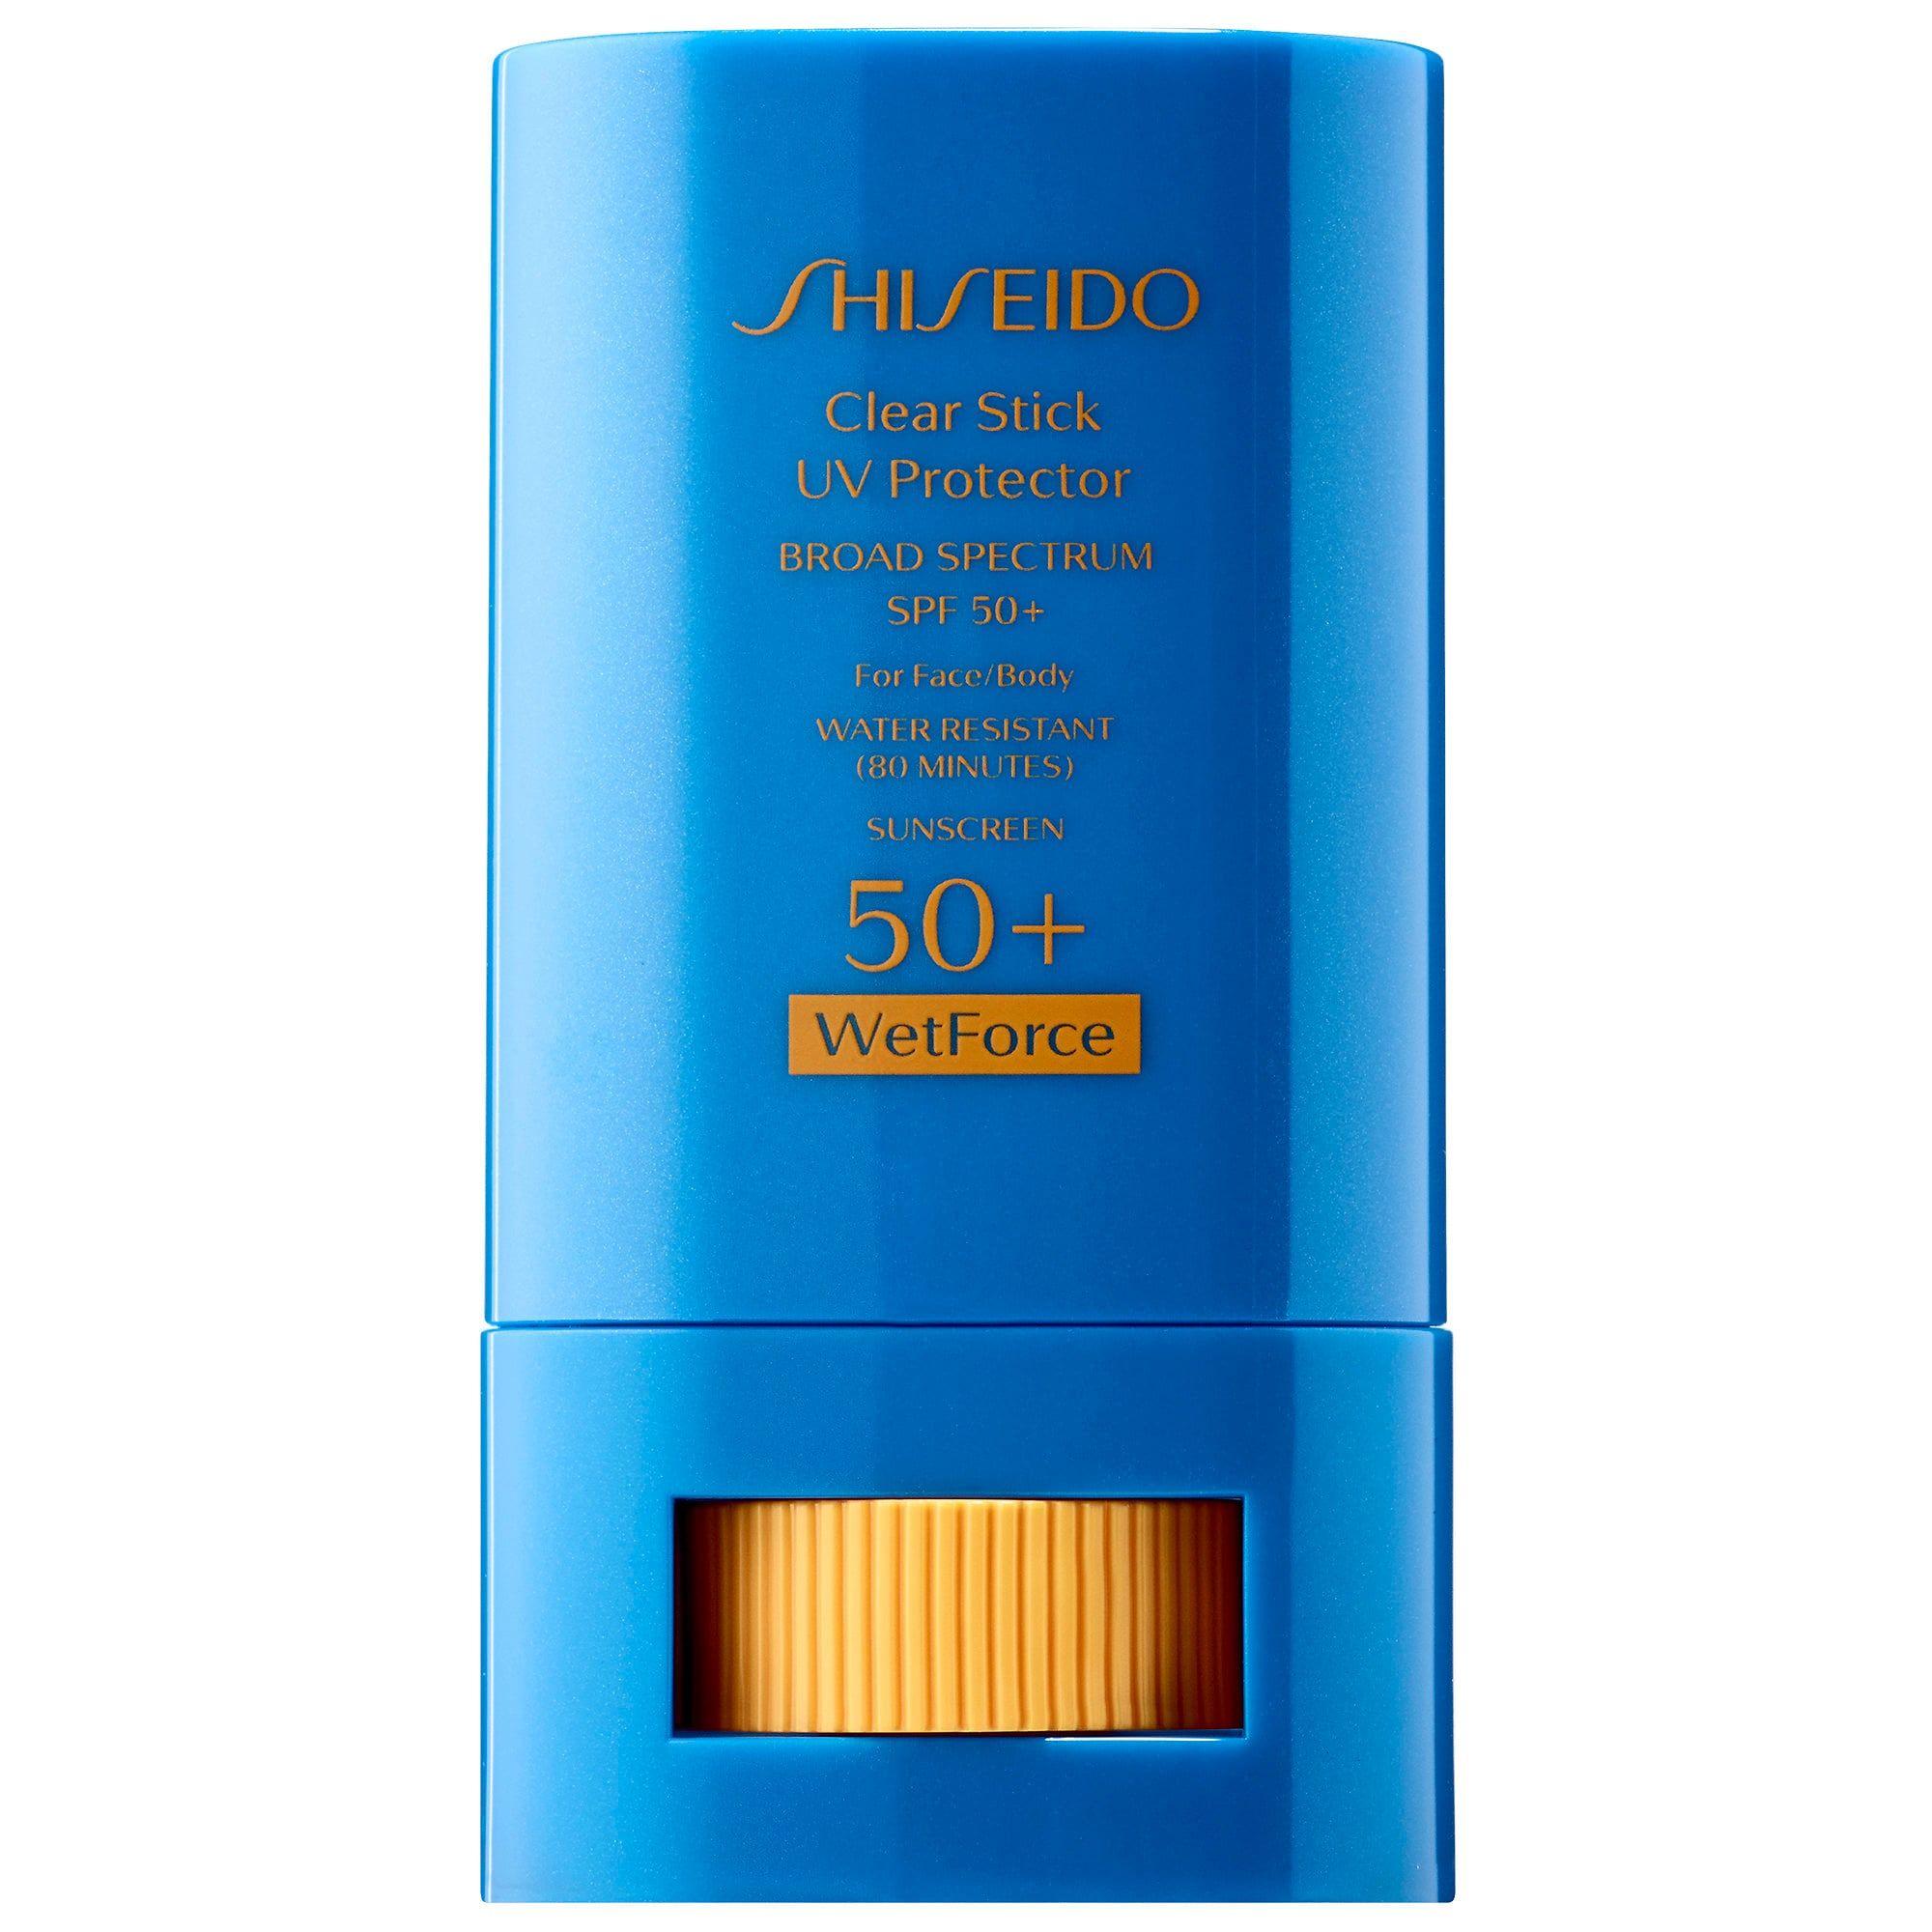 Shiseido Clear Stick UV Protector WetForce Broad Spectrum